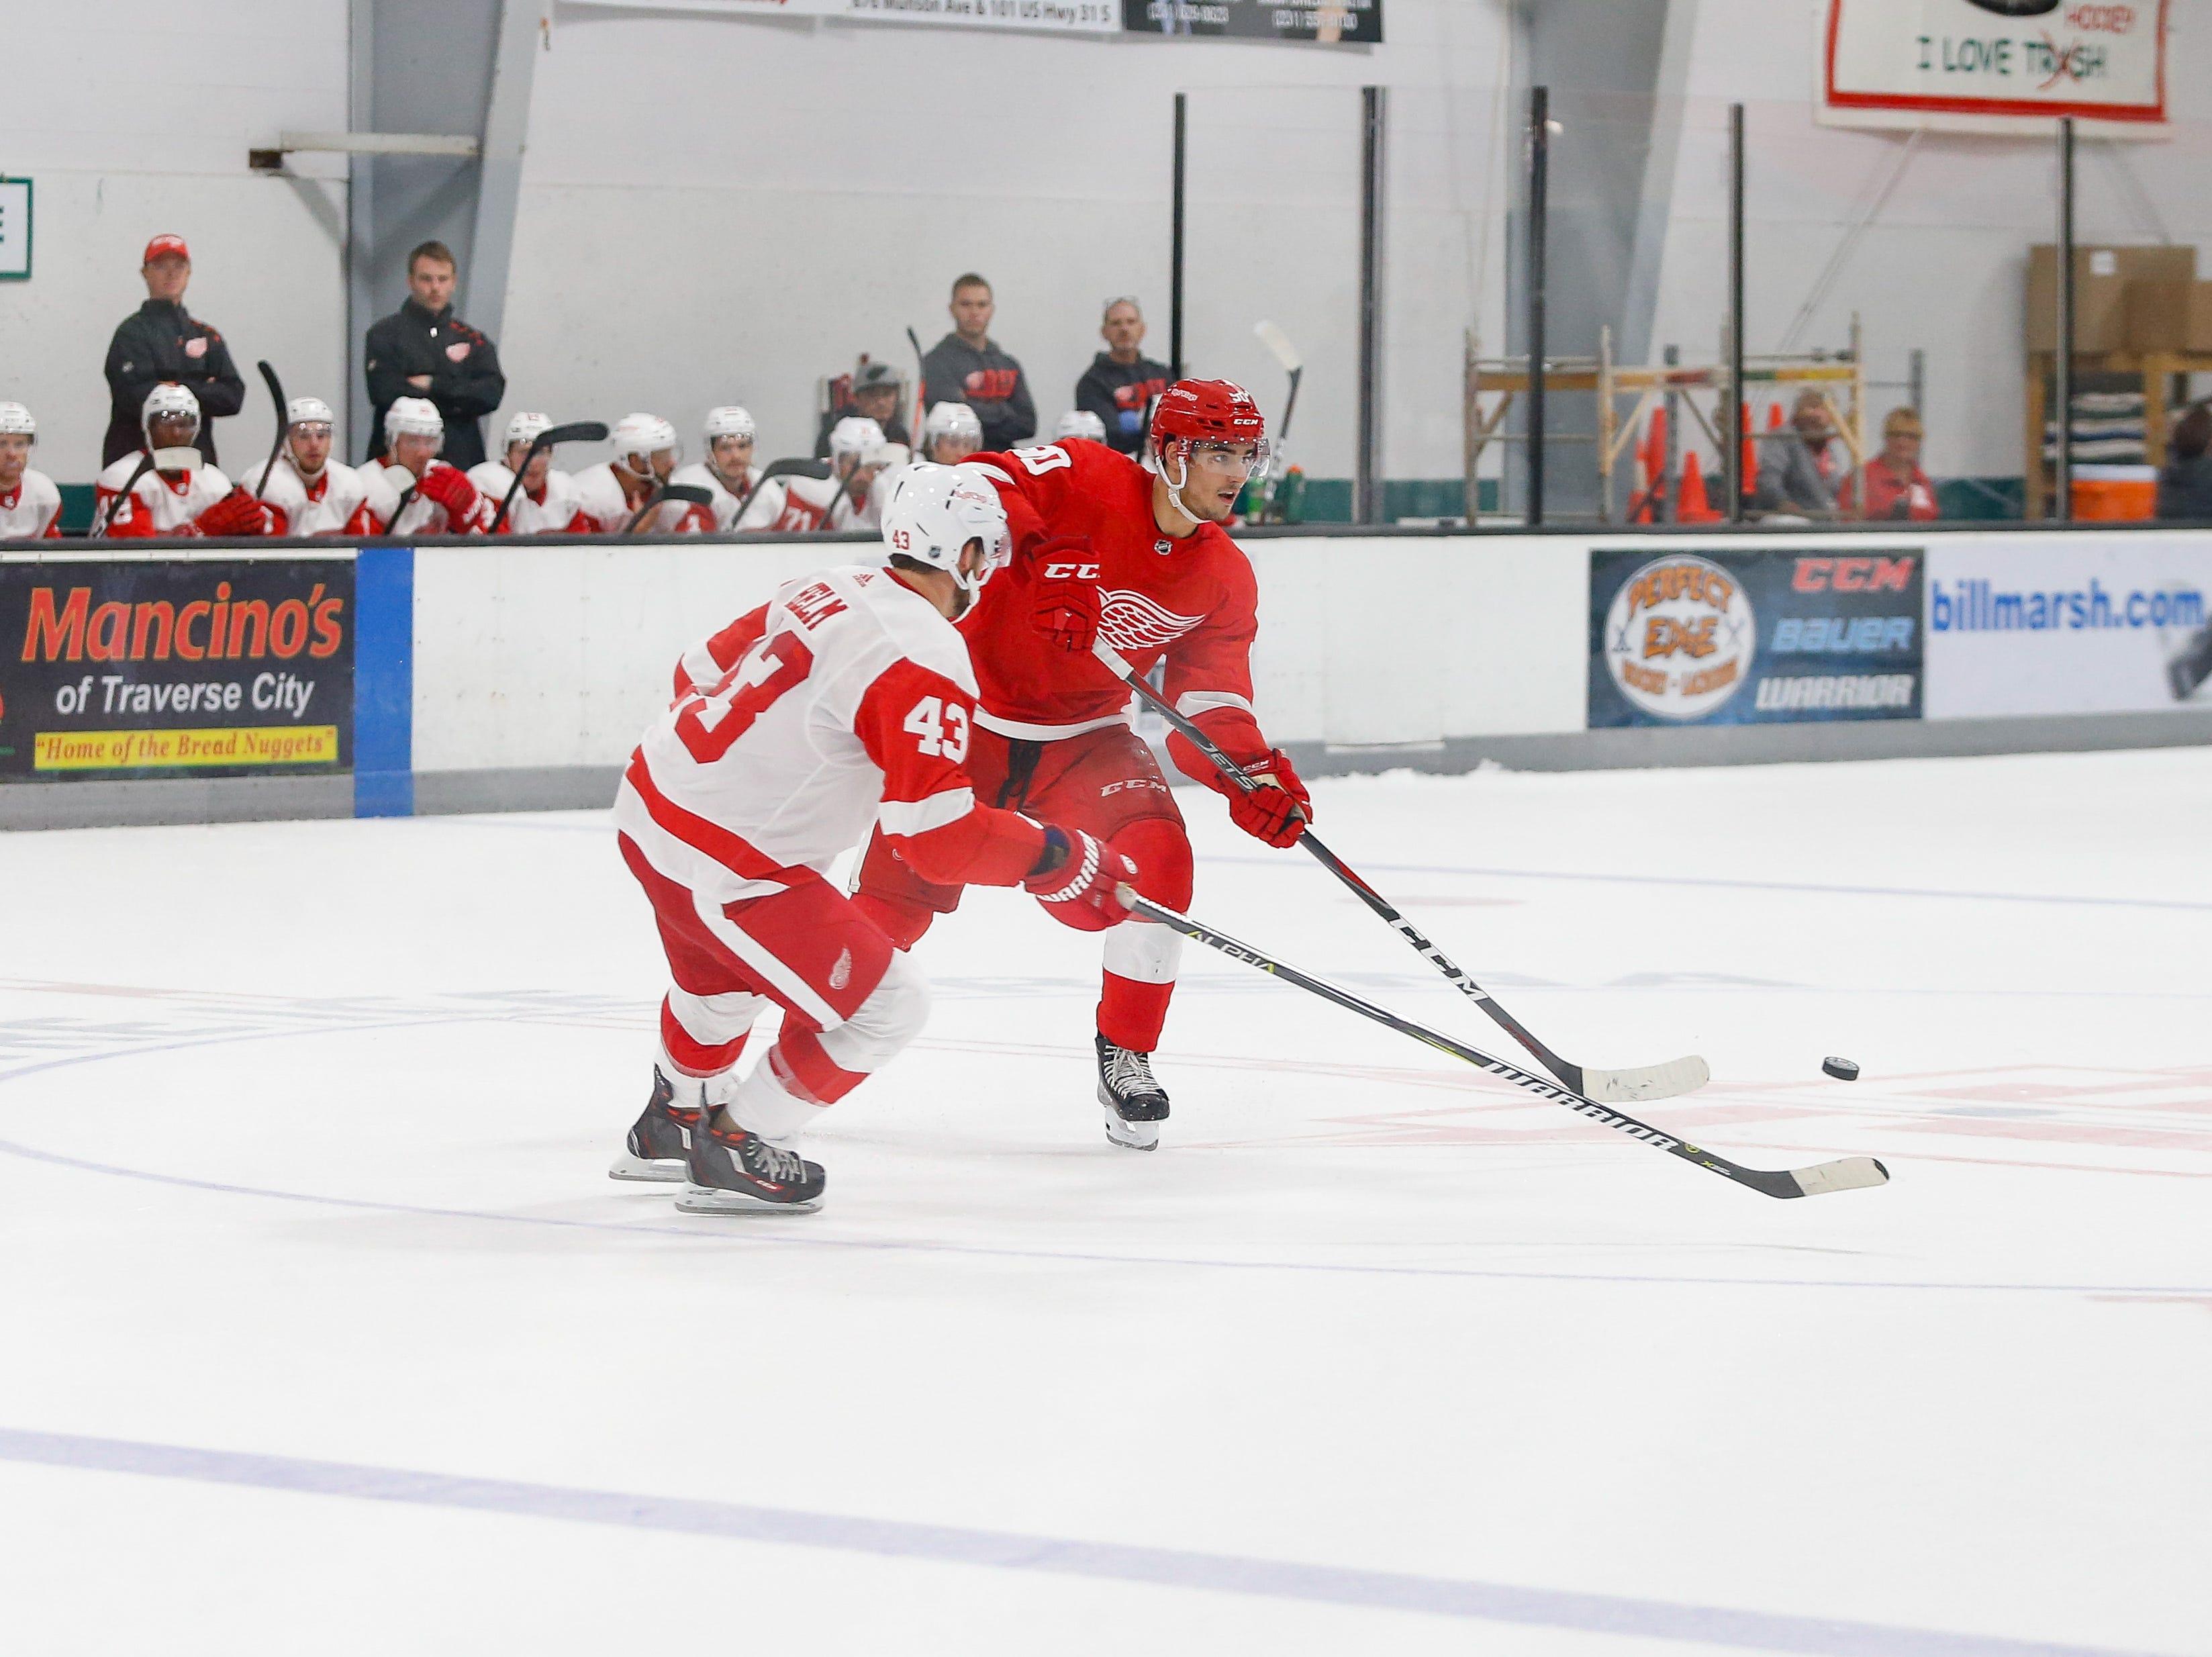 Joe Veleno sends a pass across ice as Darren Helm defends the white zone.